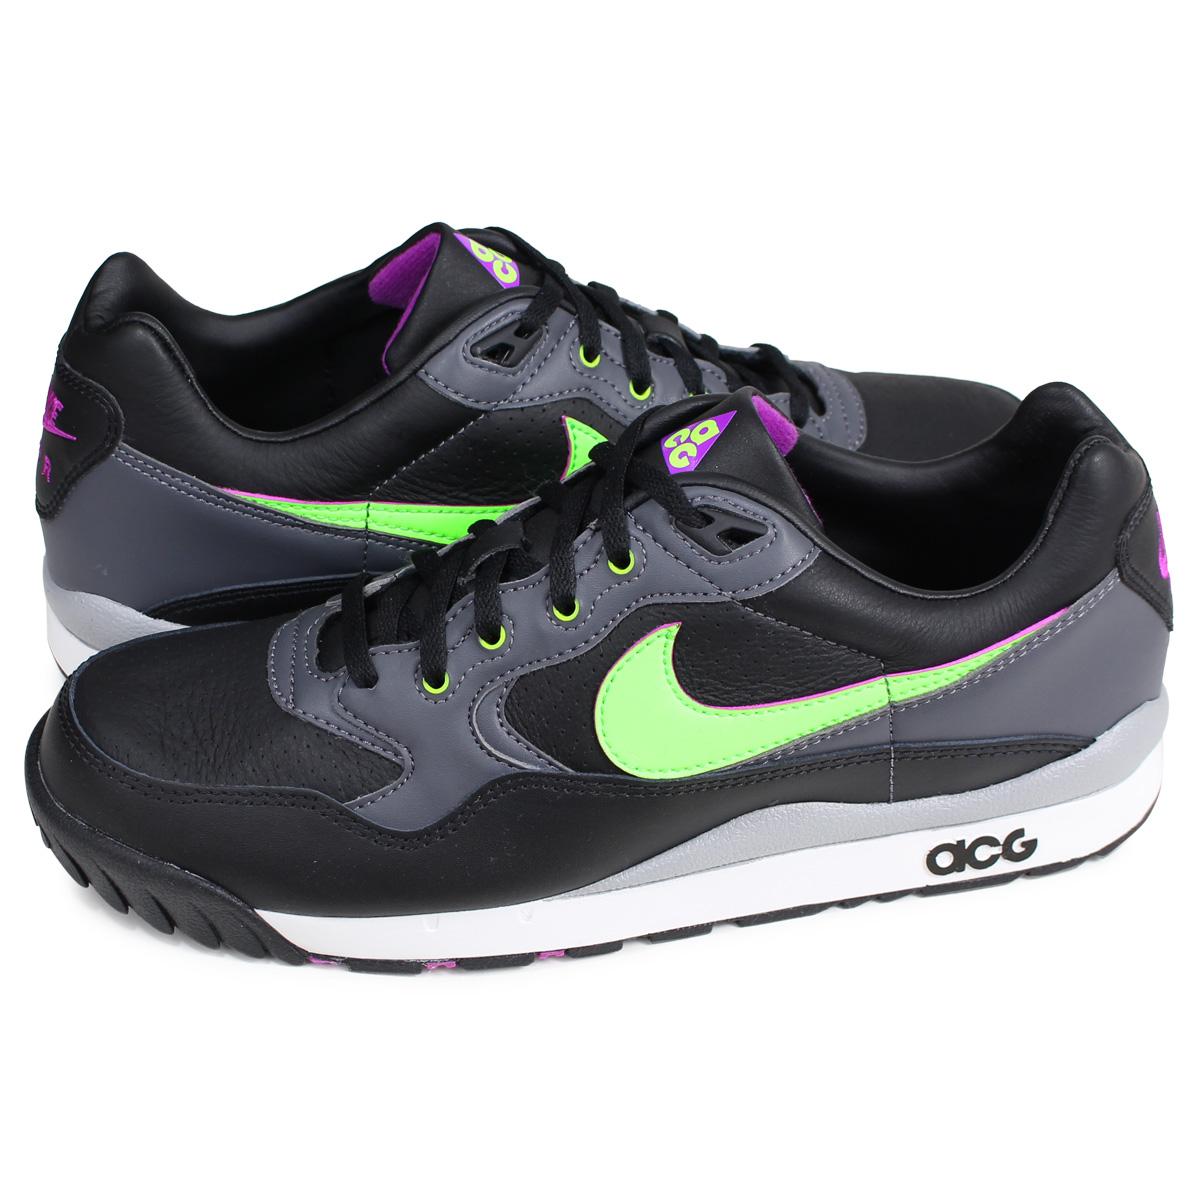 e848719cec Nike NIKE air wildwood sneakers men AIR WILDWOOD ACG black black AO3116-002  [193 ...